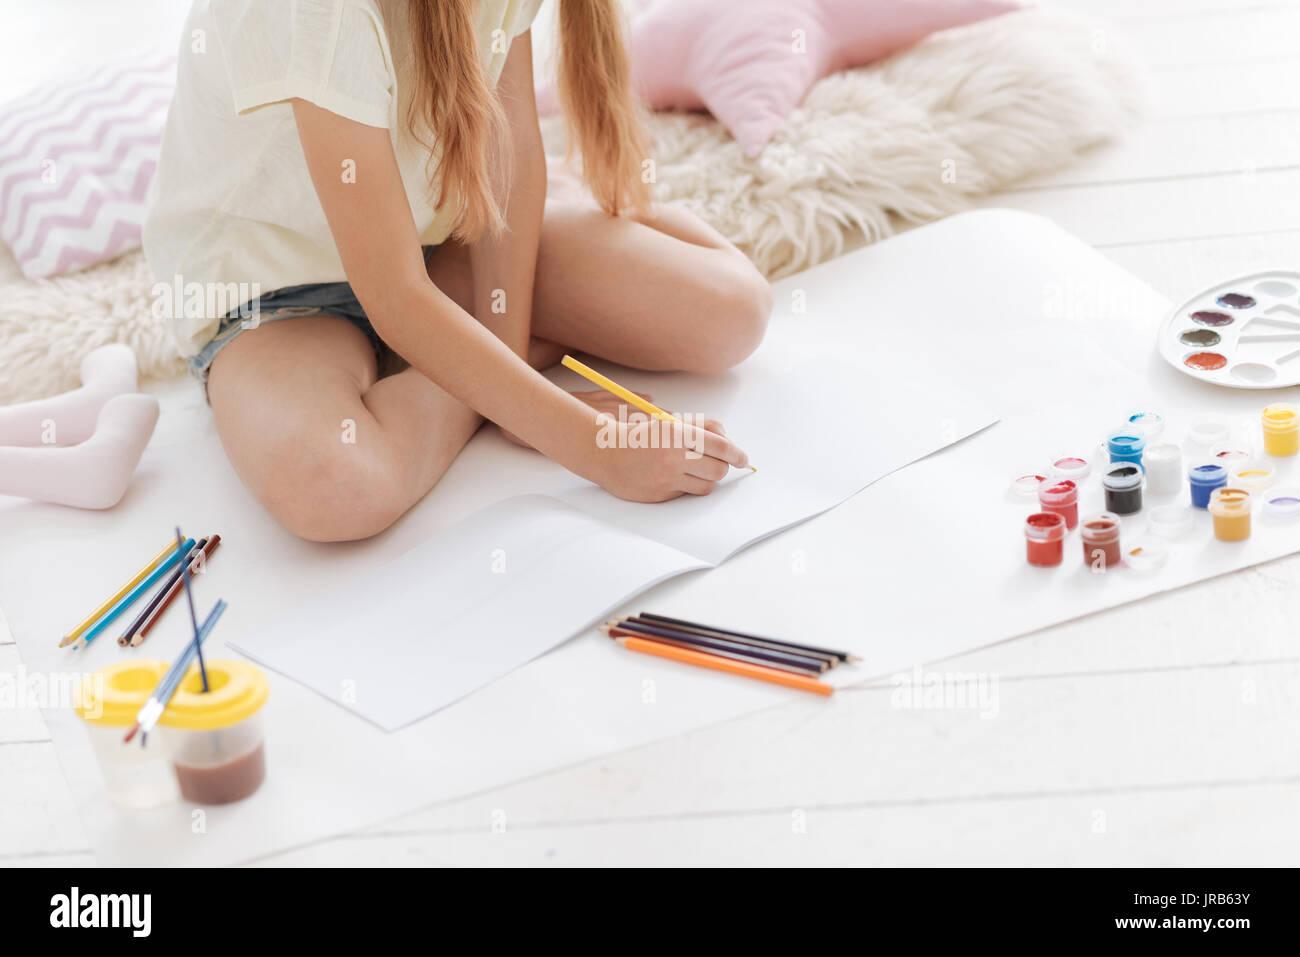 Cerca de chica de dibujo con lápices Imagen De Stock